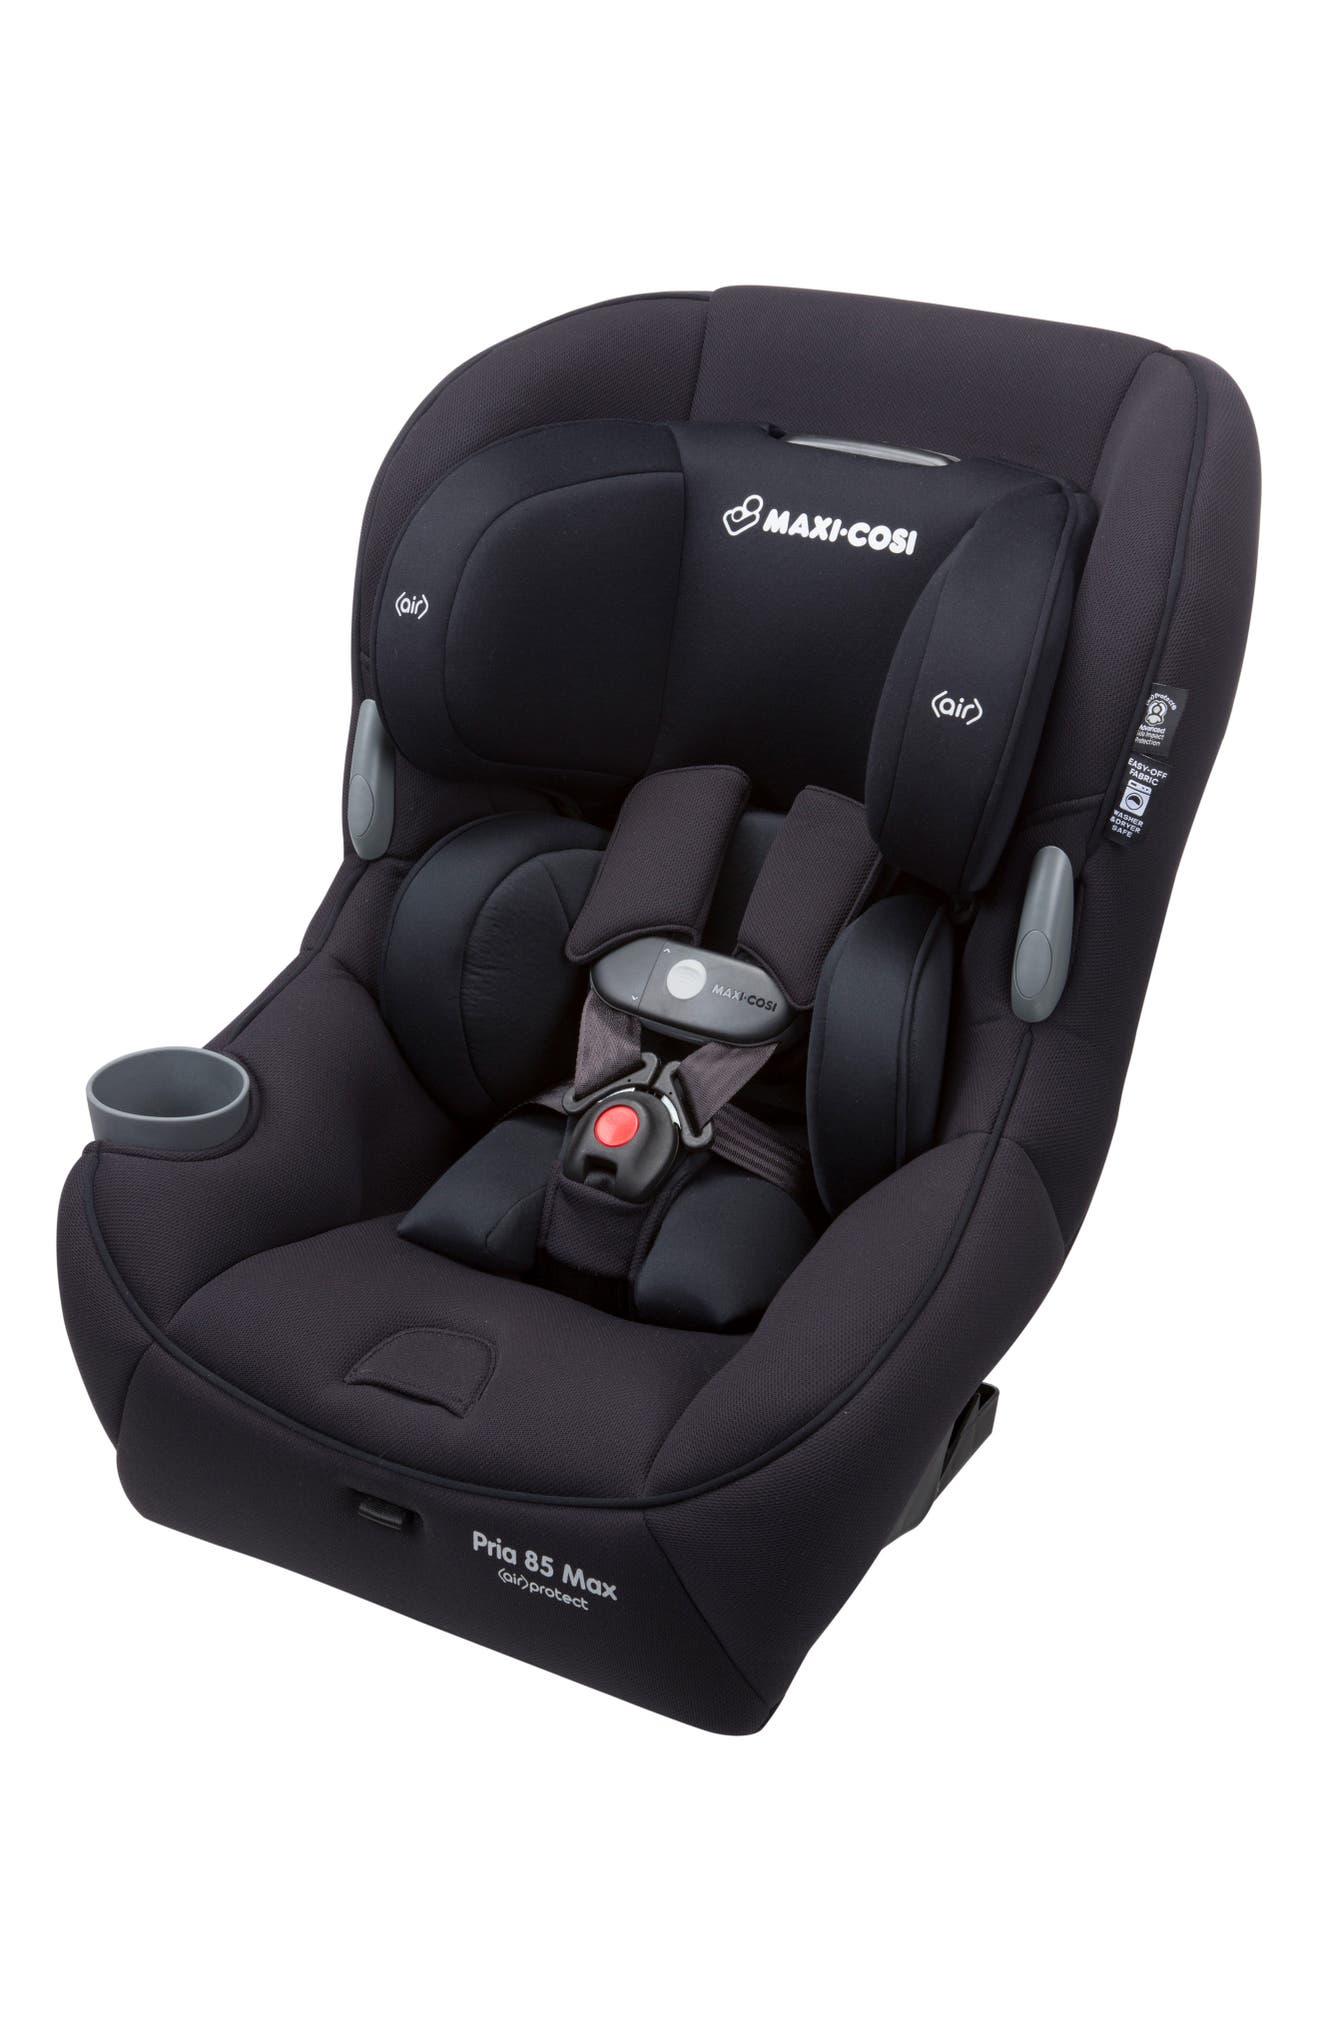 Maxi CosiR PriaTM 85 Max Convertible Car Seat